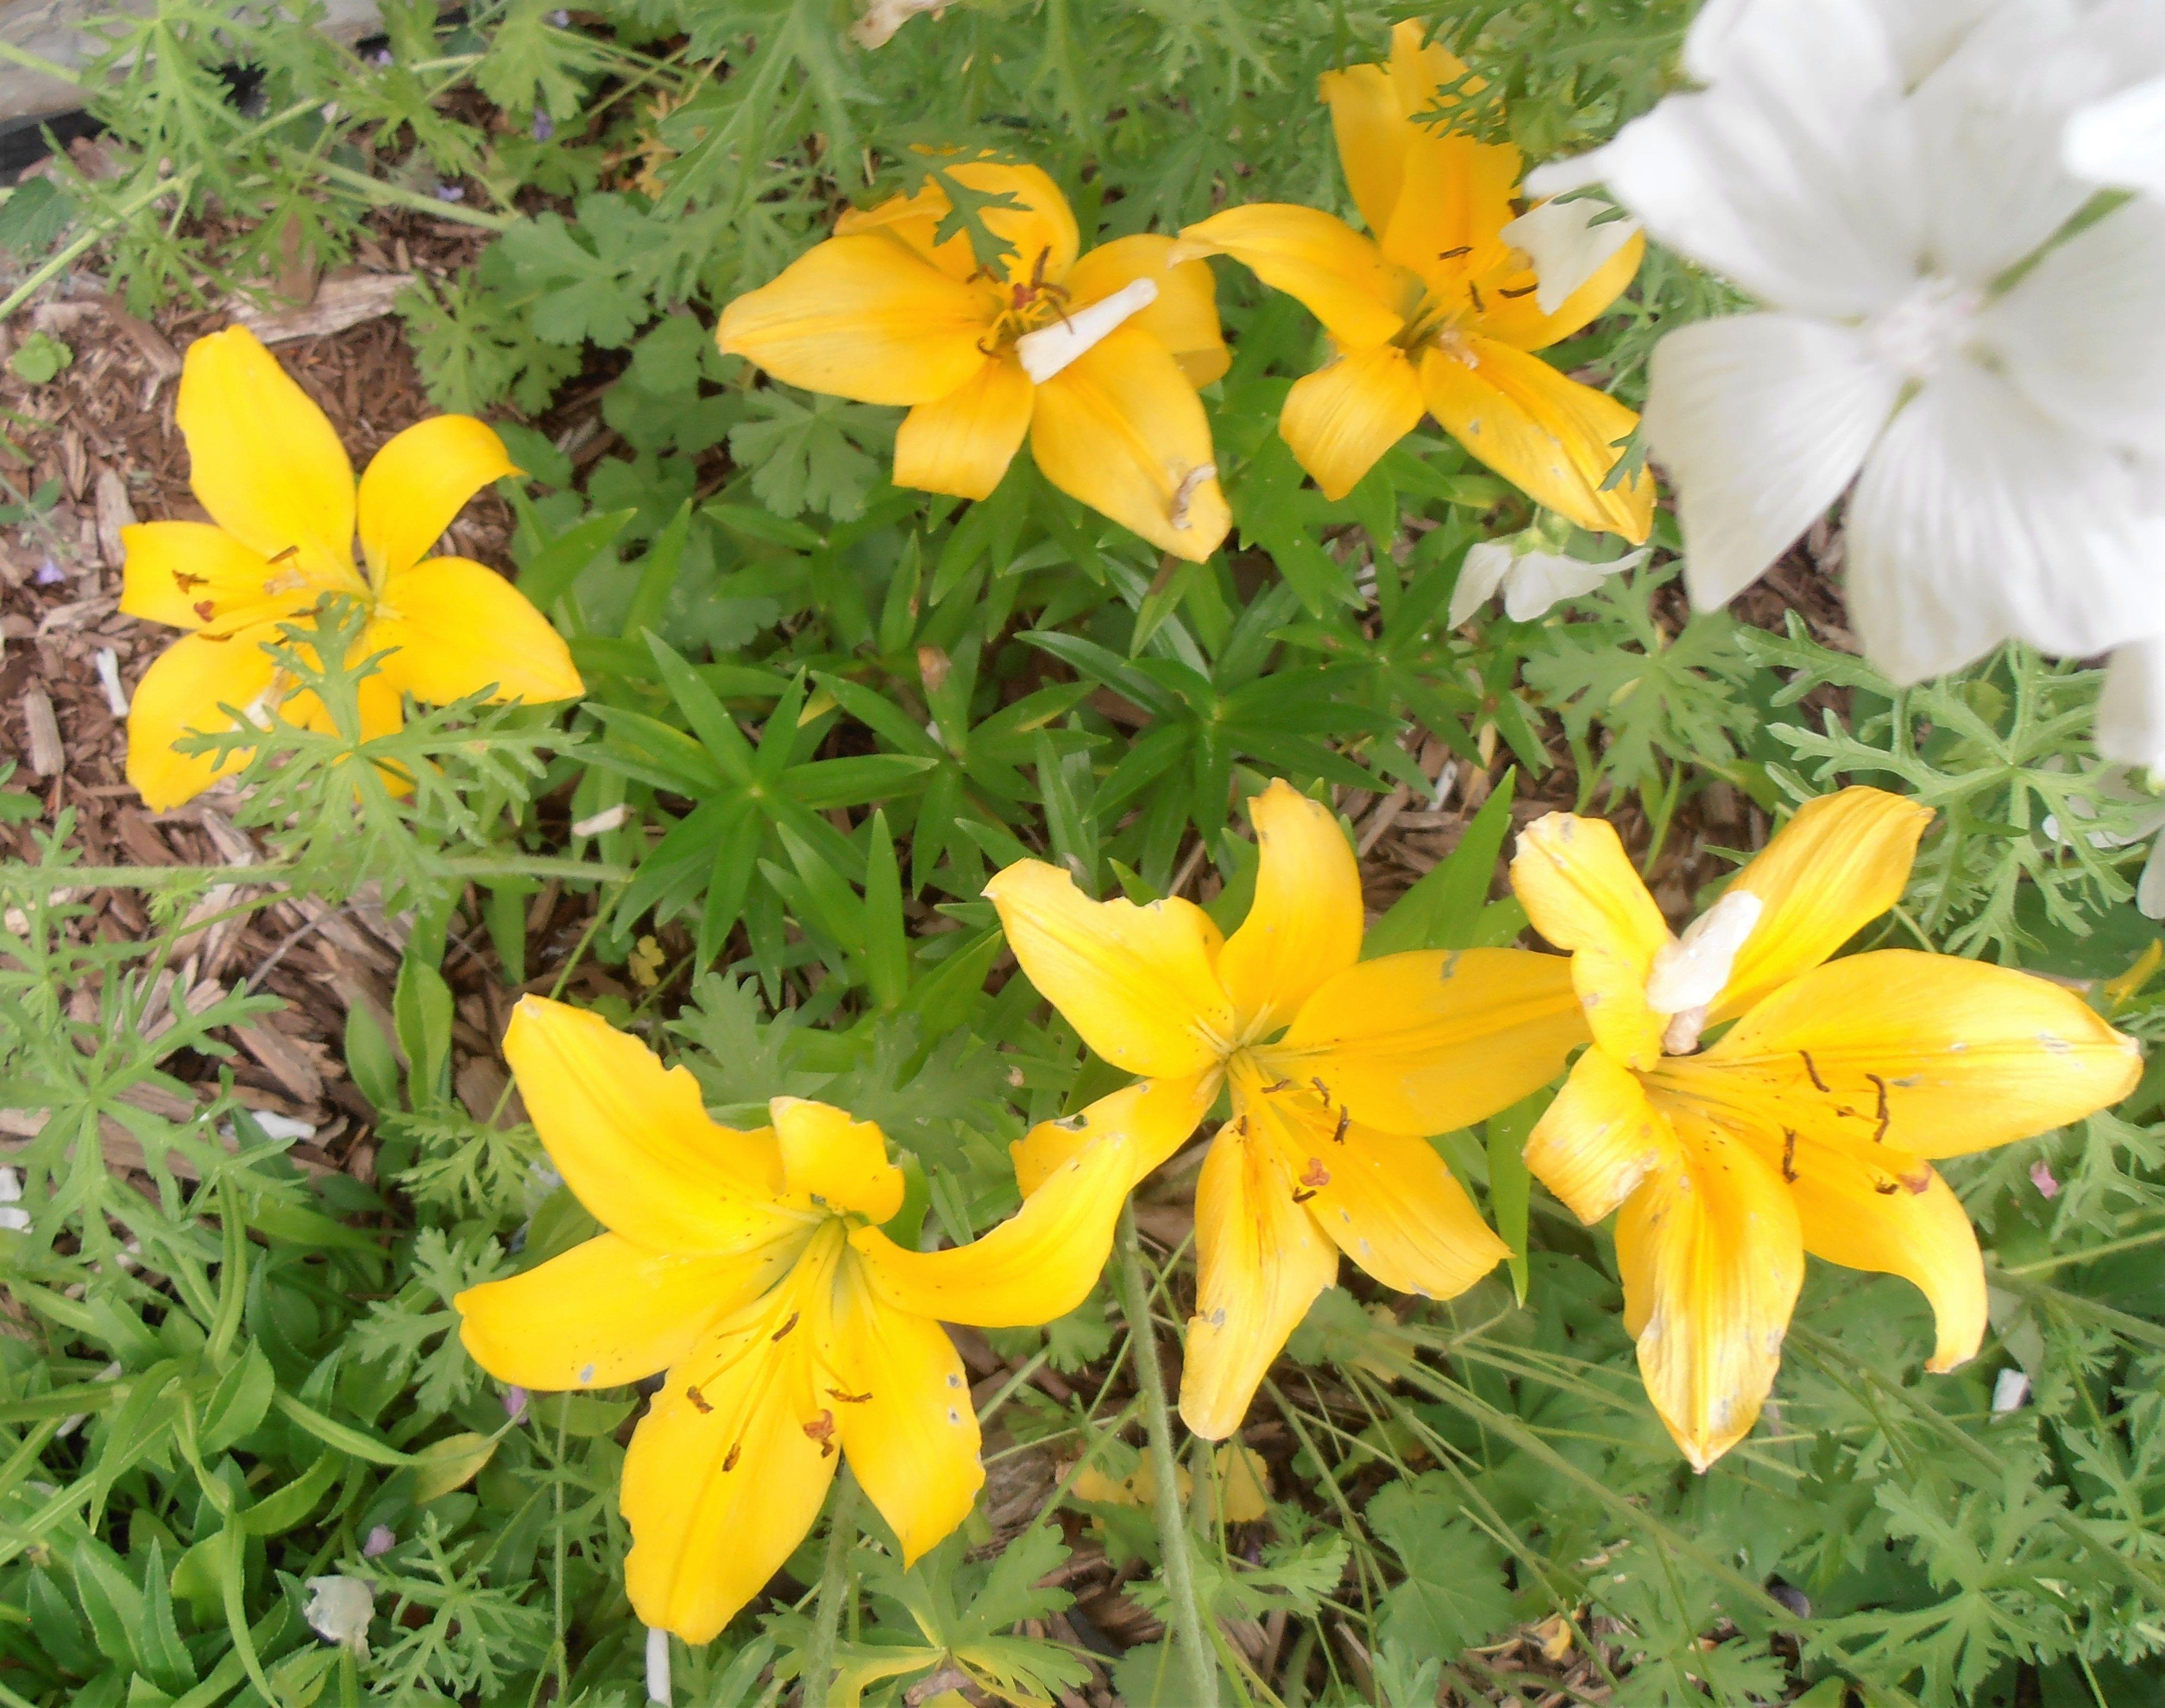 Lilies yellow flowers flowers flower garden yellow